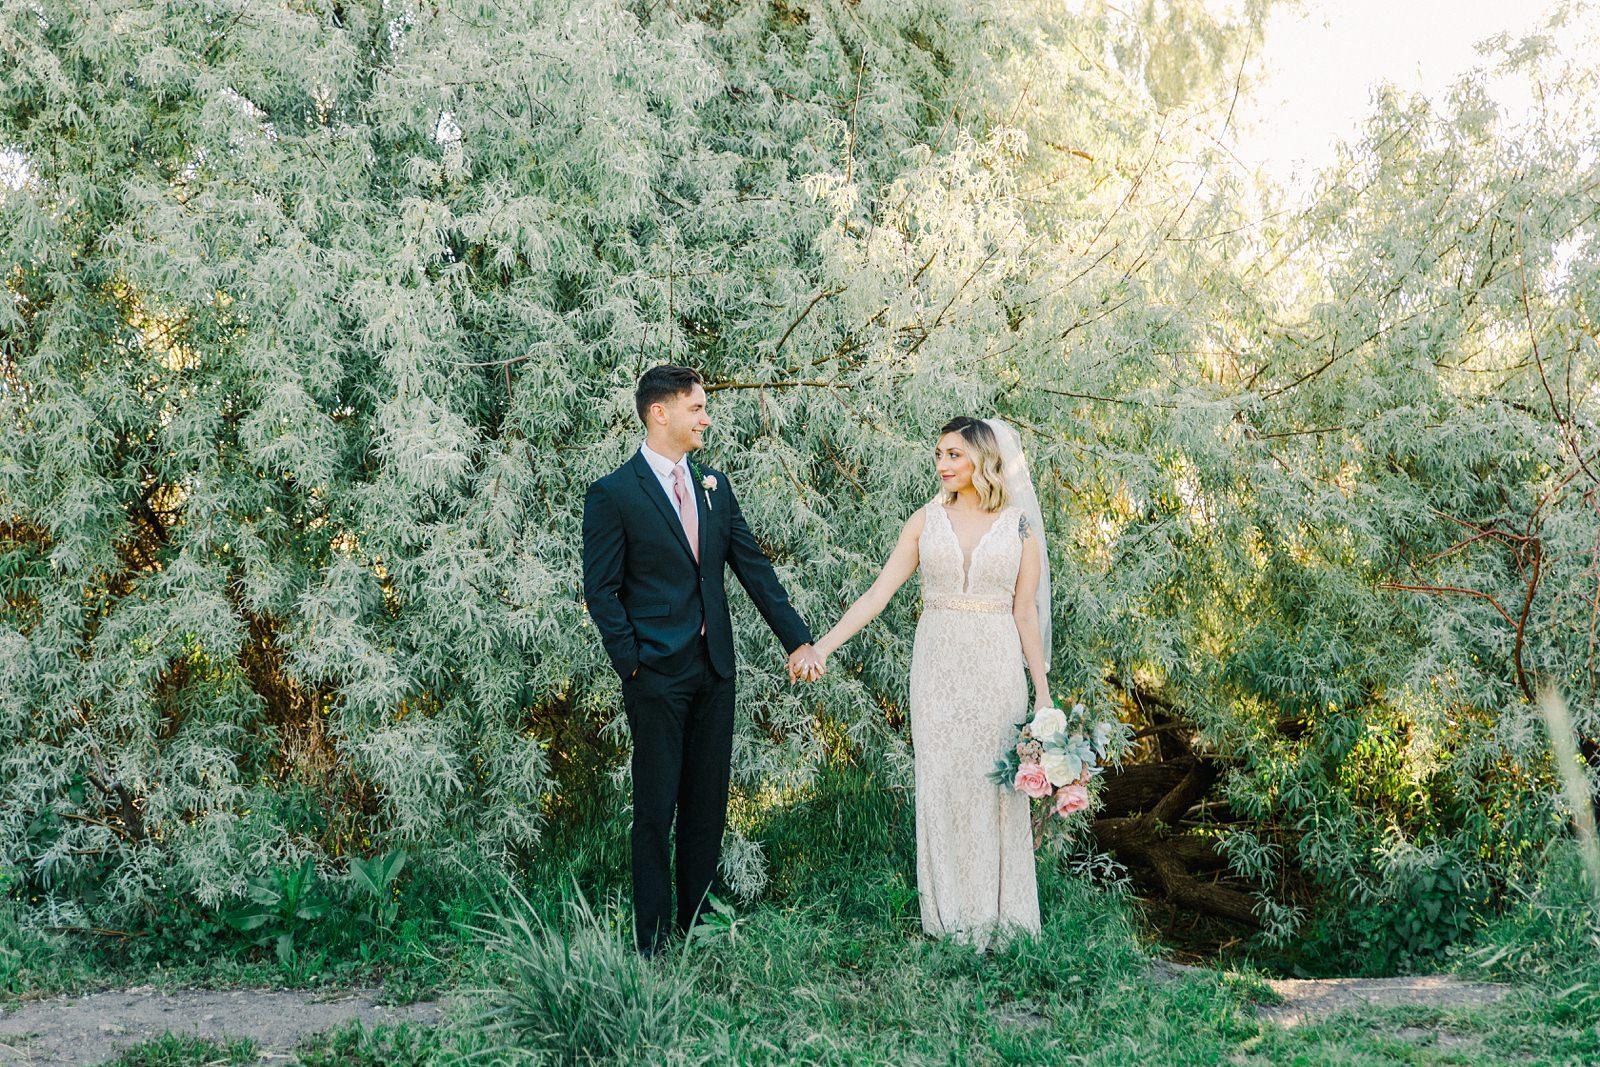 Sunset Bridal Session at Tunnel Springs Park | Salt Lake City